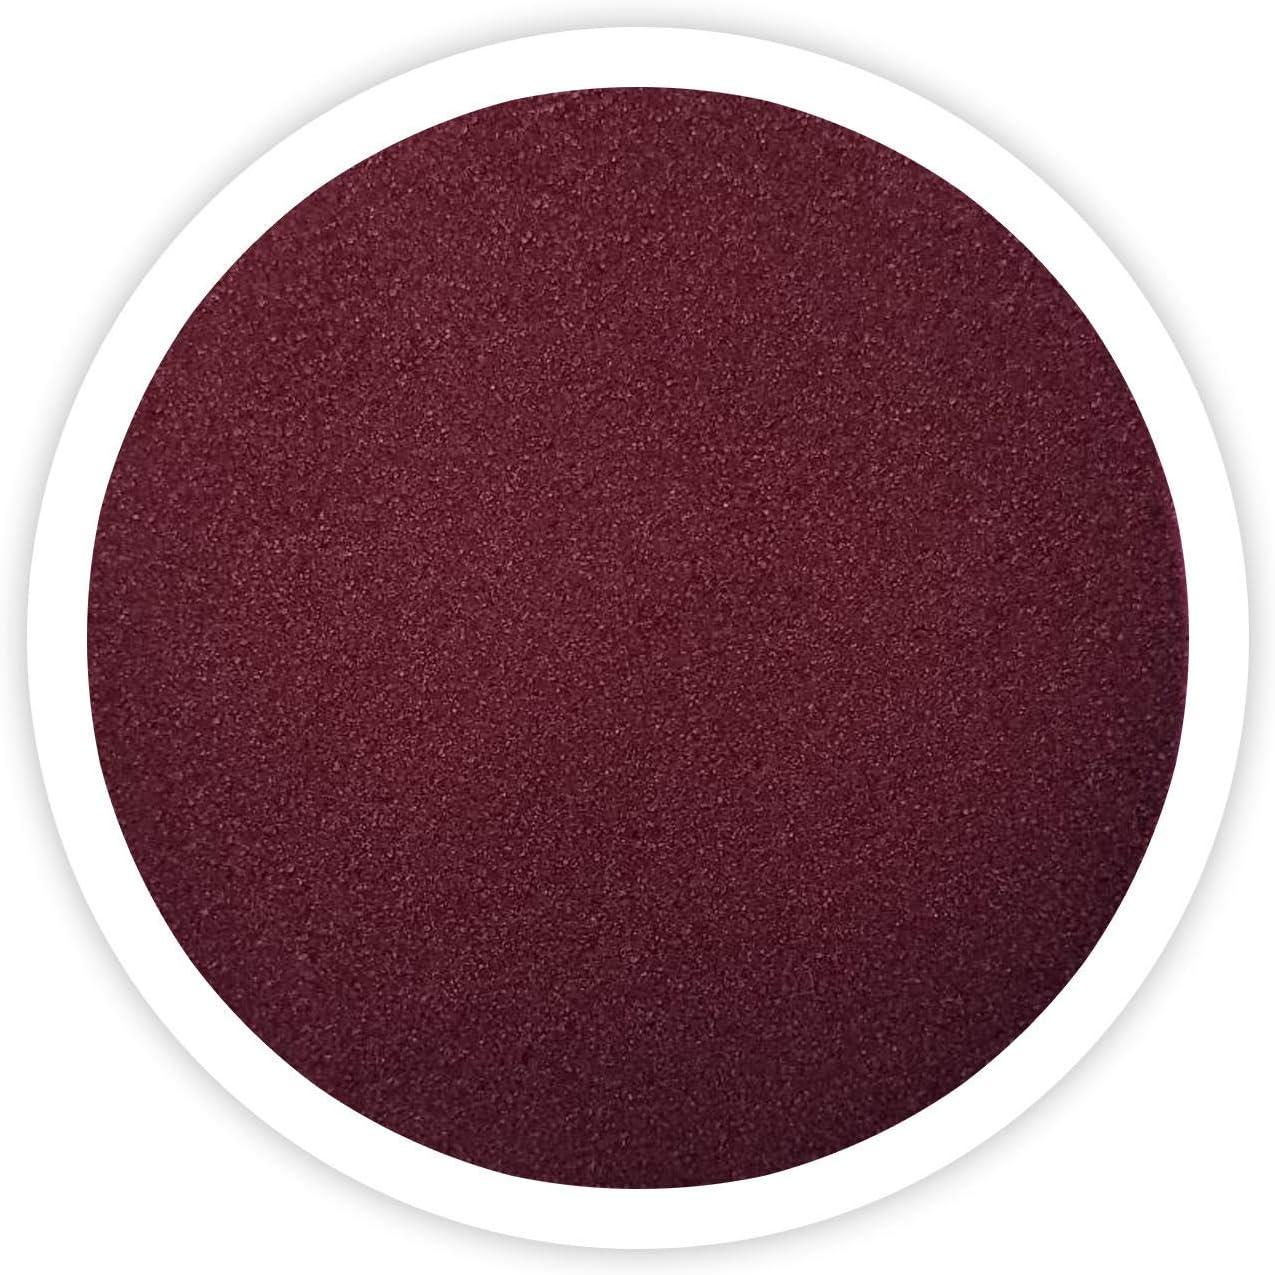 Sandsational Burgundy Unity Sand~1.5 lbs (22 oz), Burgundy Colored Sand for Weddings, Vase Filler, Home Decor, Craft Sand